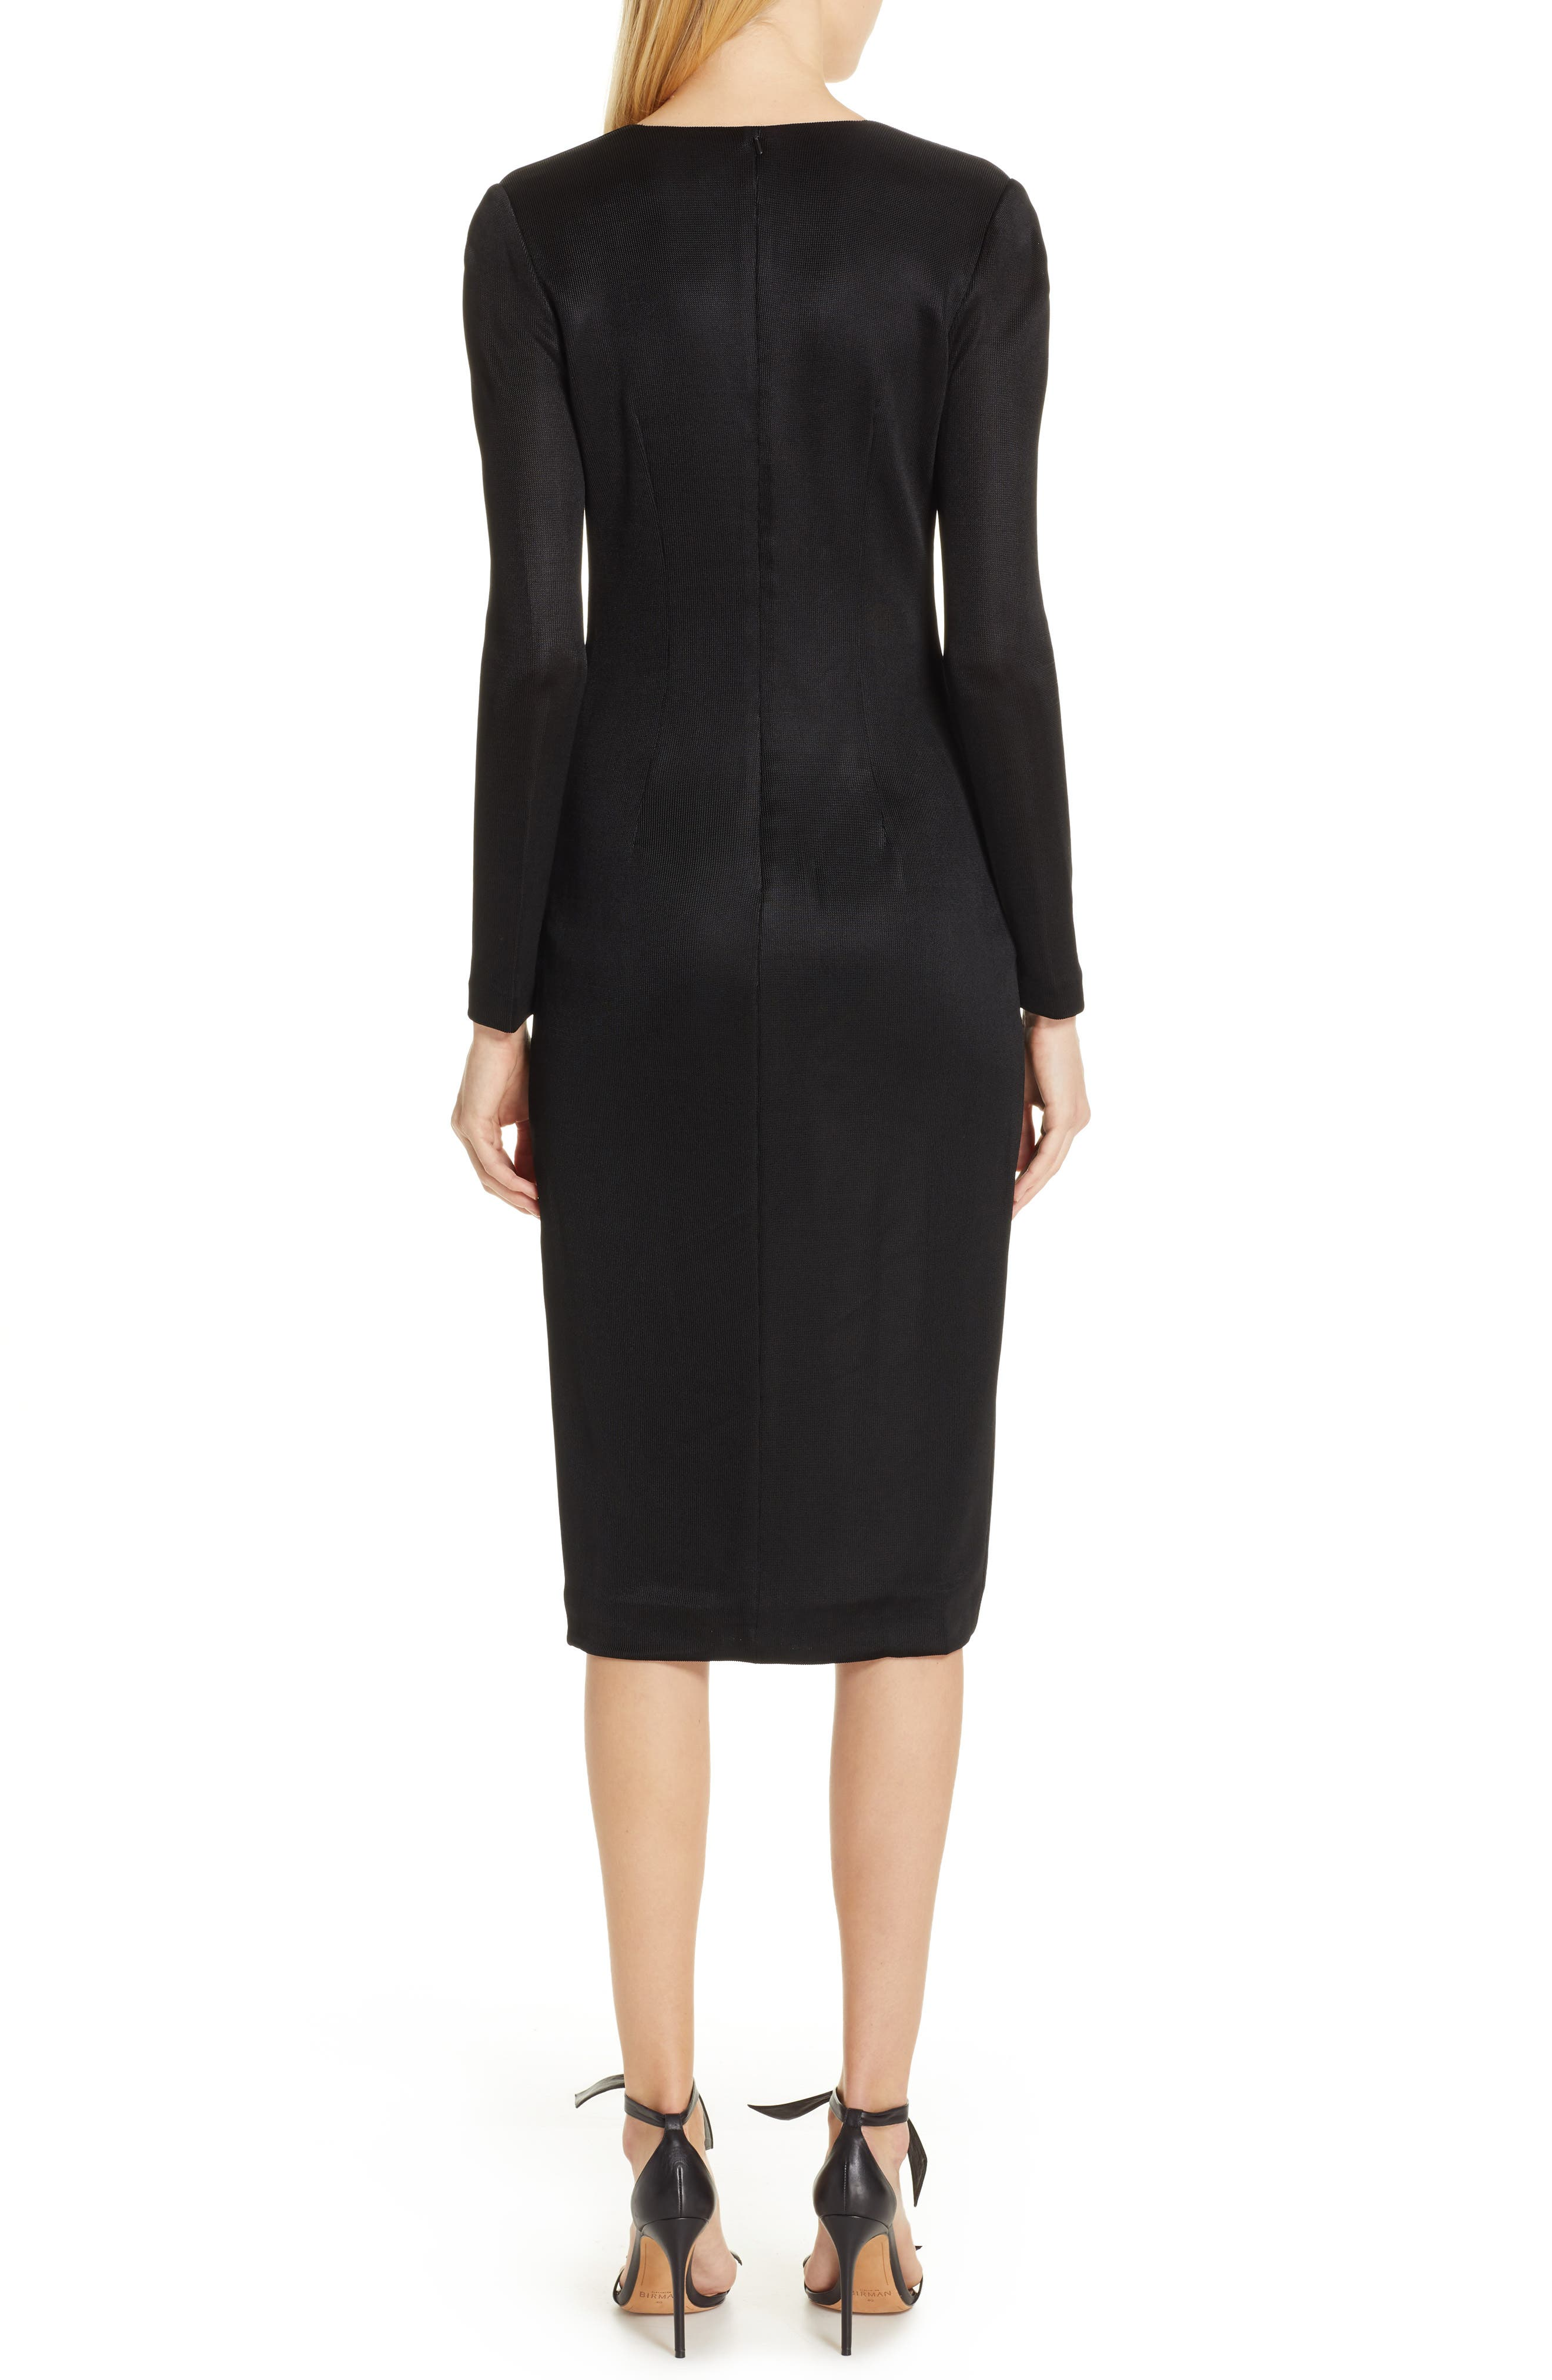 CUSHNIE, Sahara Pencil Dress, Alternate thumbnail 2, color, BLACK